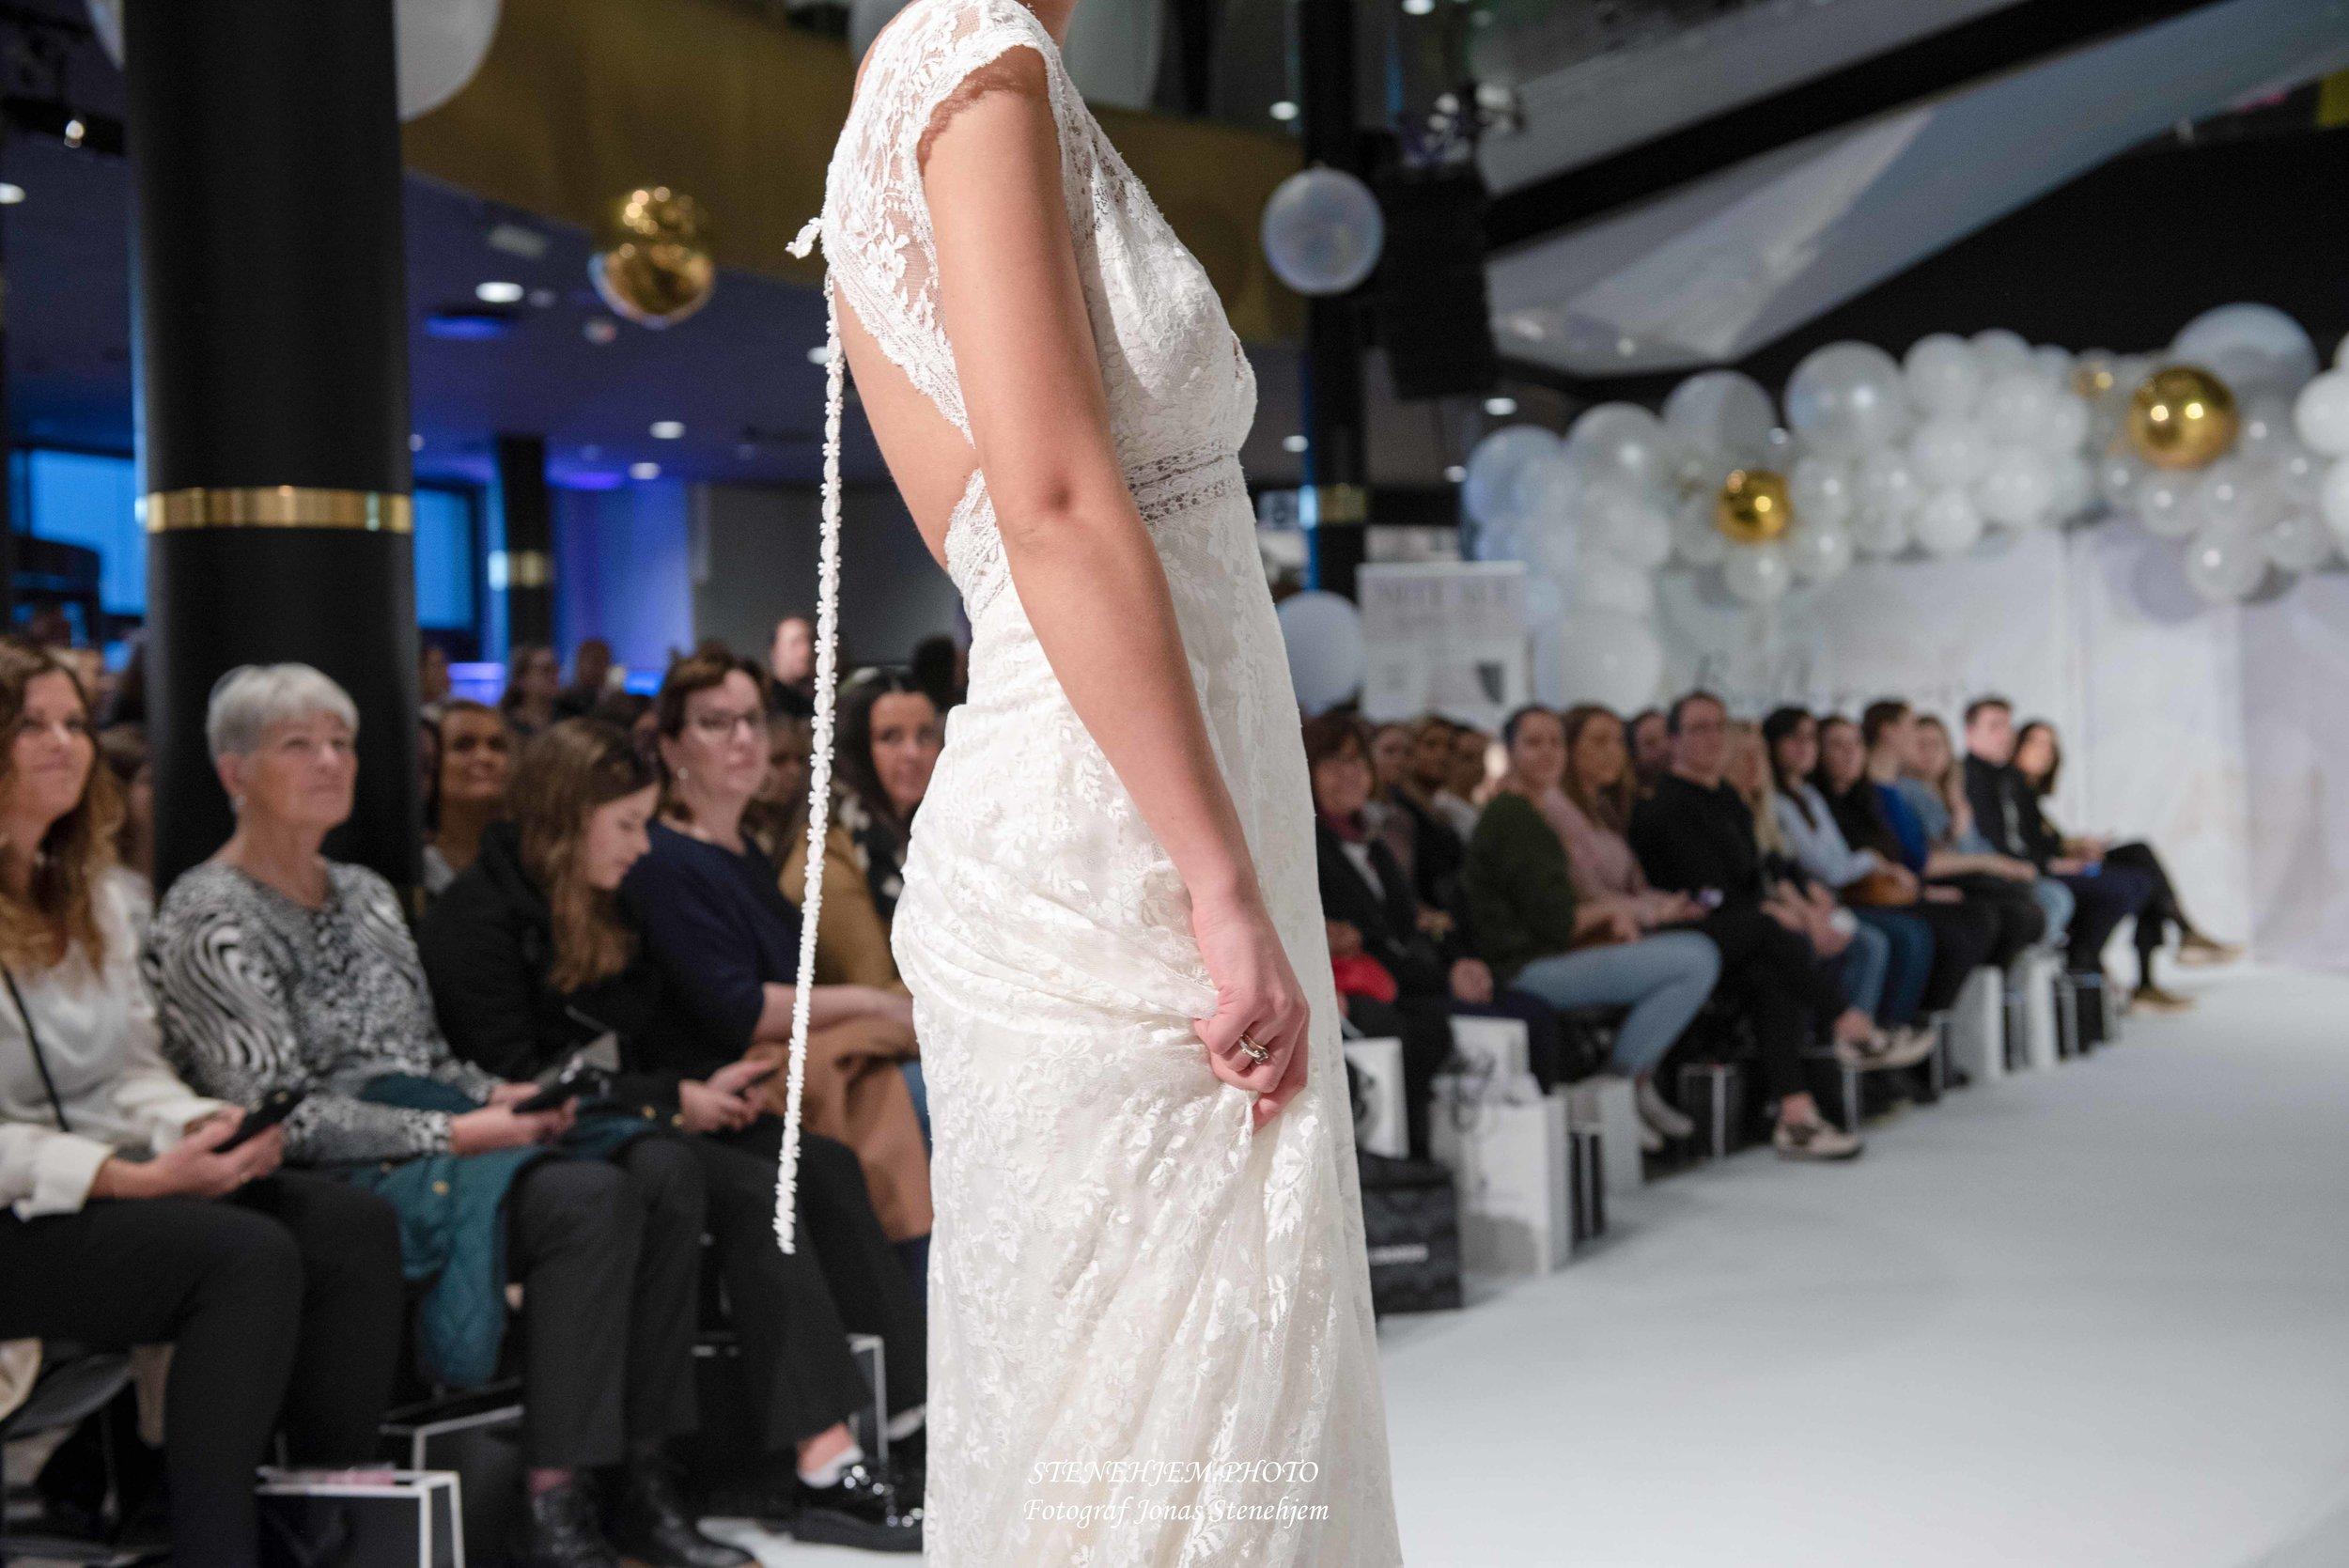 Bryllupsmesse_Lagunen_mittaltweddingfair__108.jpg